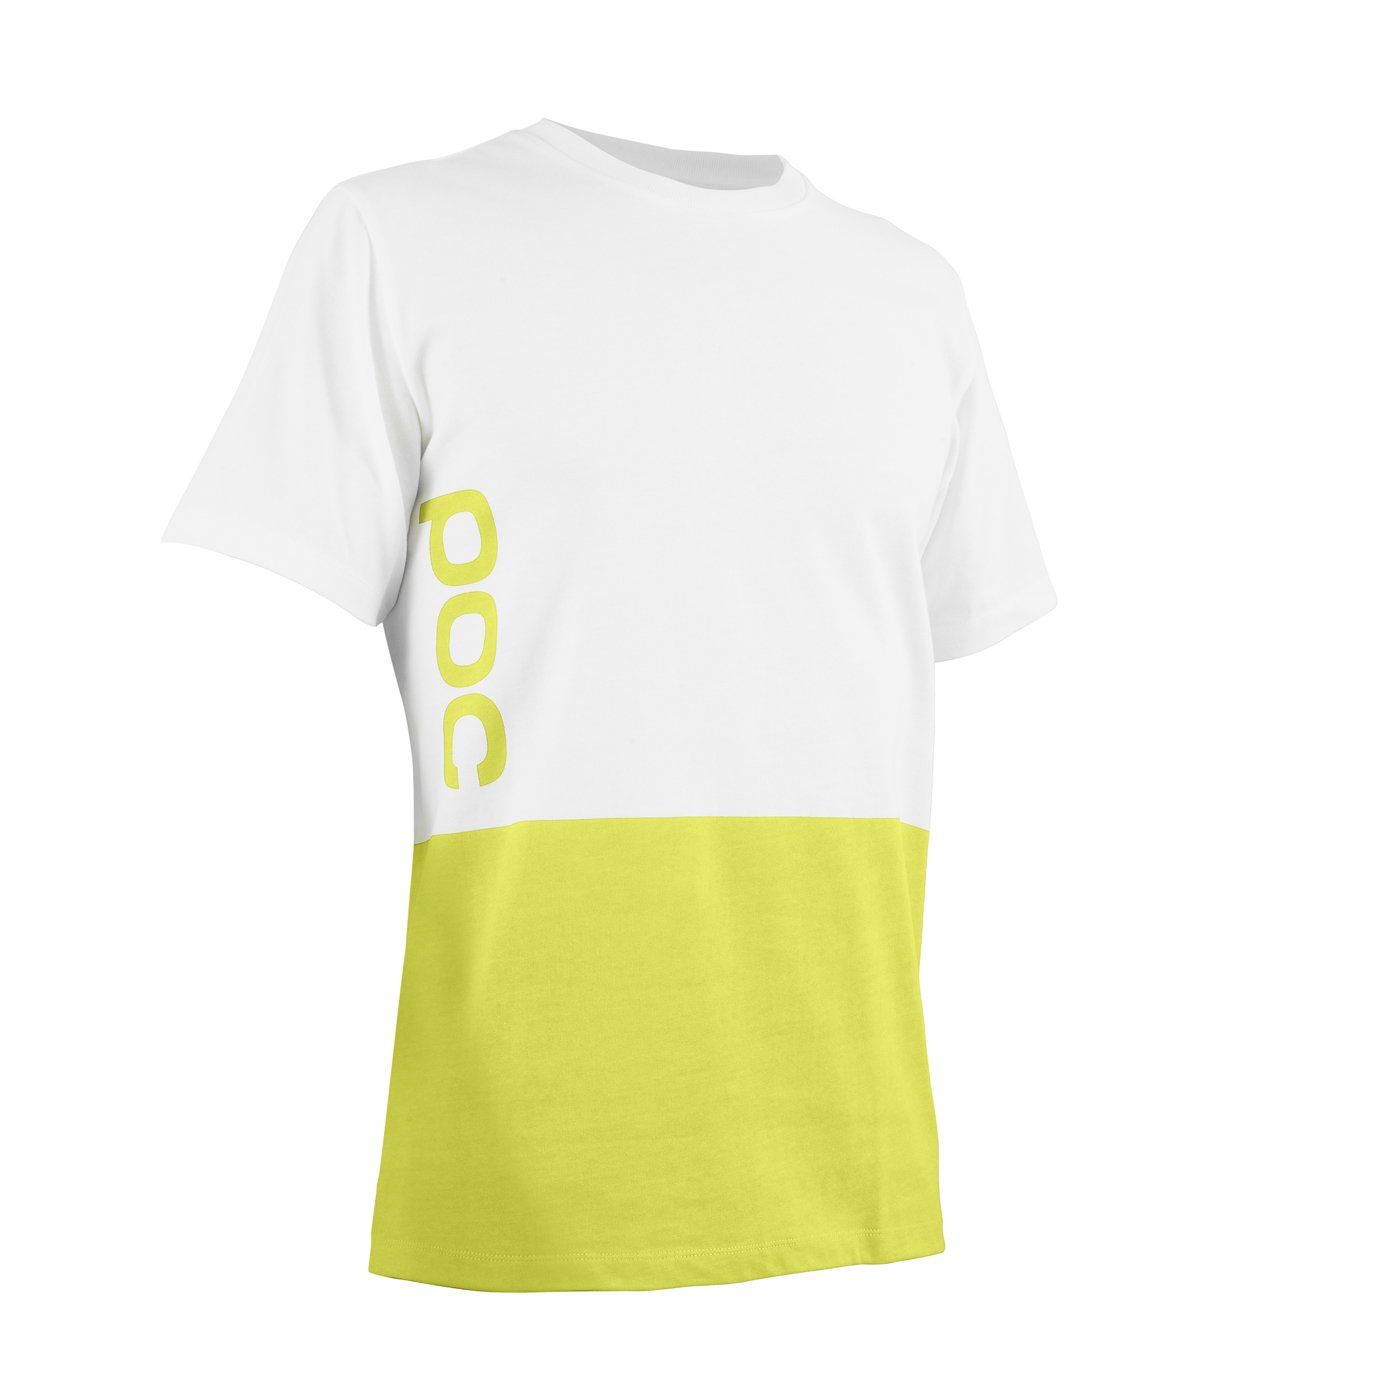 POC T-Shirt 2 Farbe Print Tee